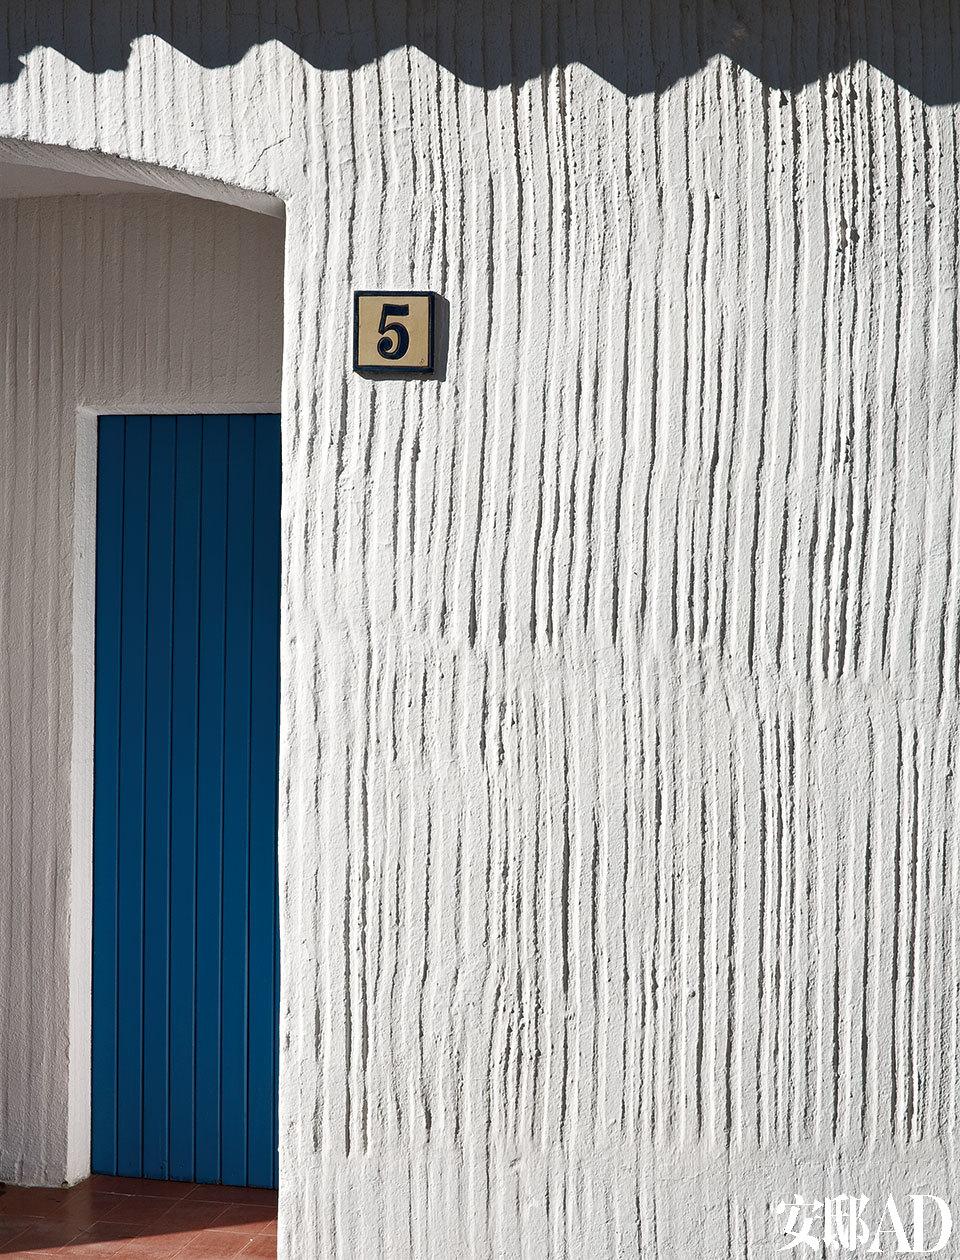 Josep María Claret i Rubira工作深入仔细,诚实庄重,建筑简单朴素,构造和外表、建设细节和最后的装饰,乃至最琐碎的细节,都透露着设计师的鉴赏力。